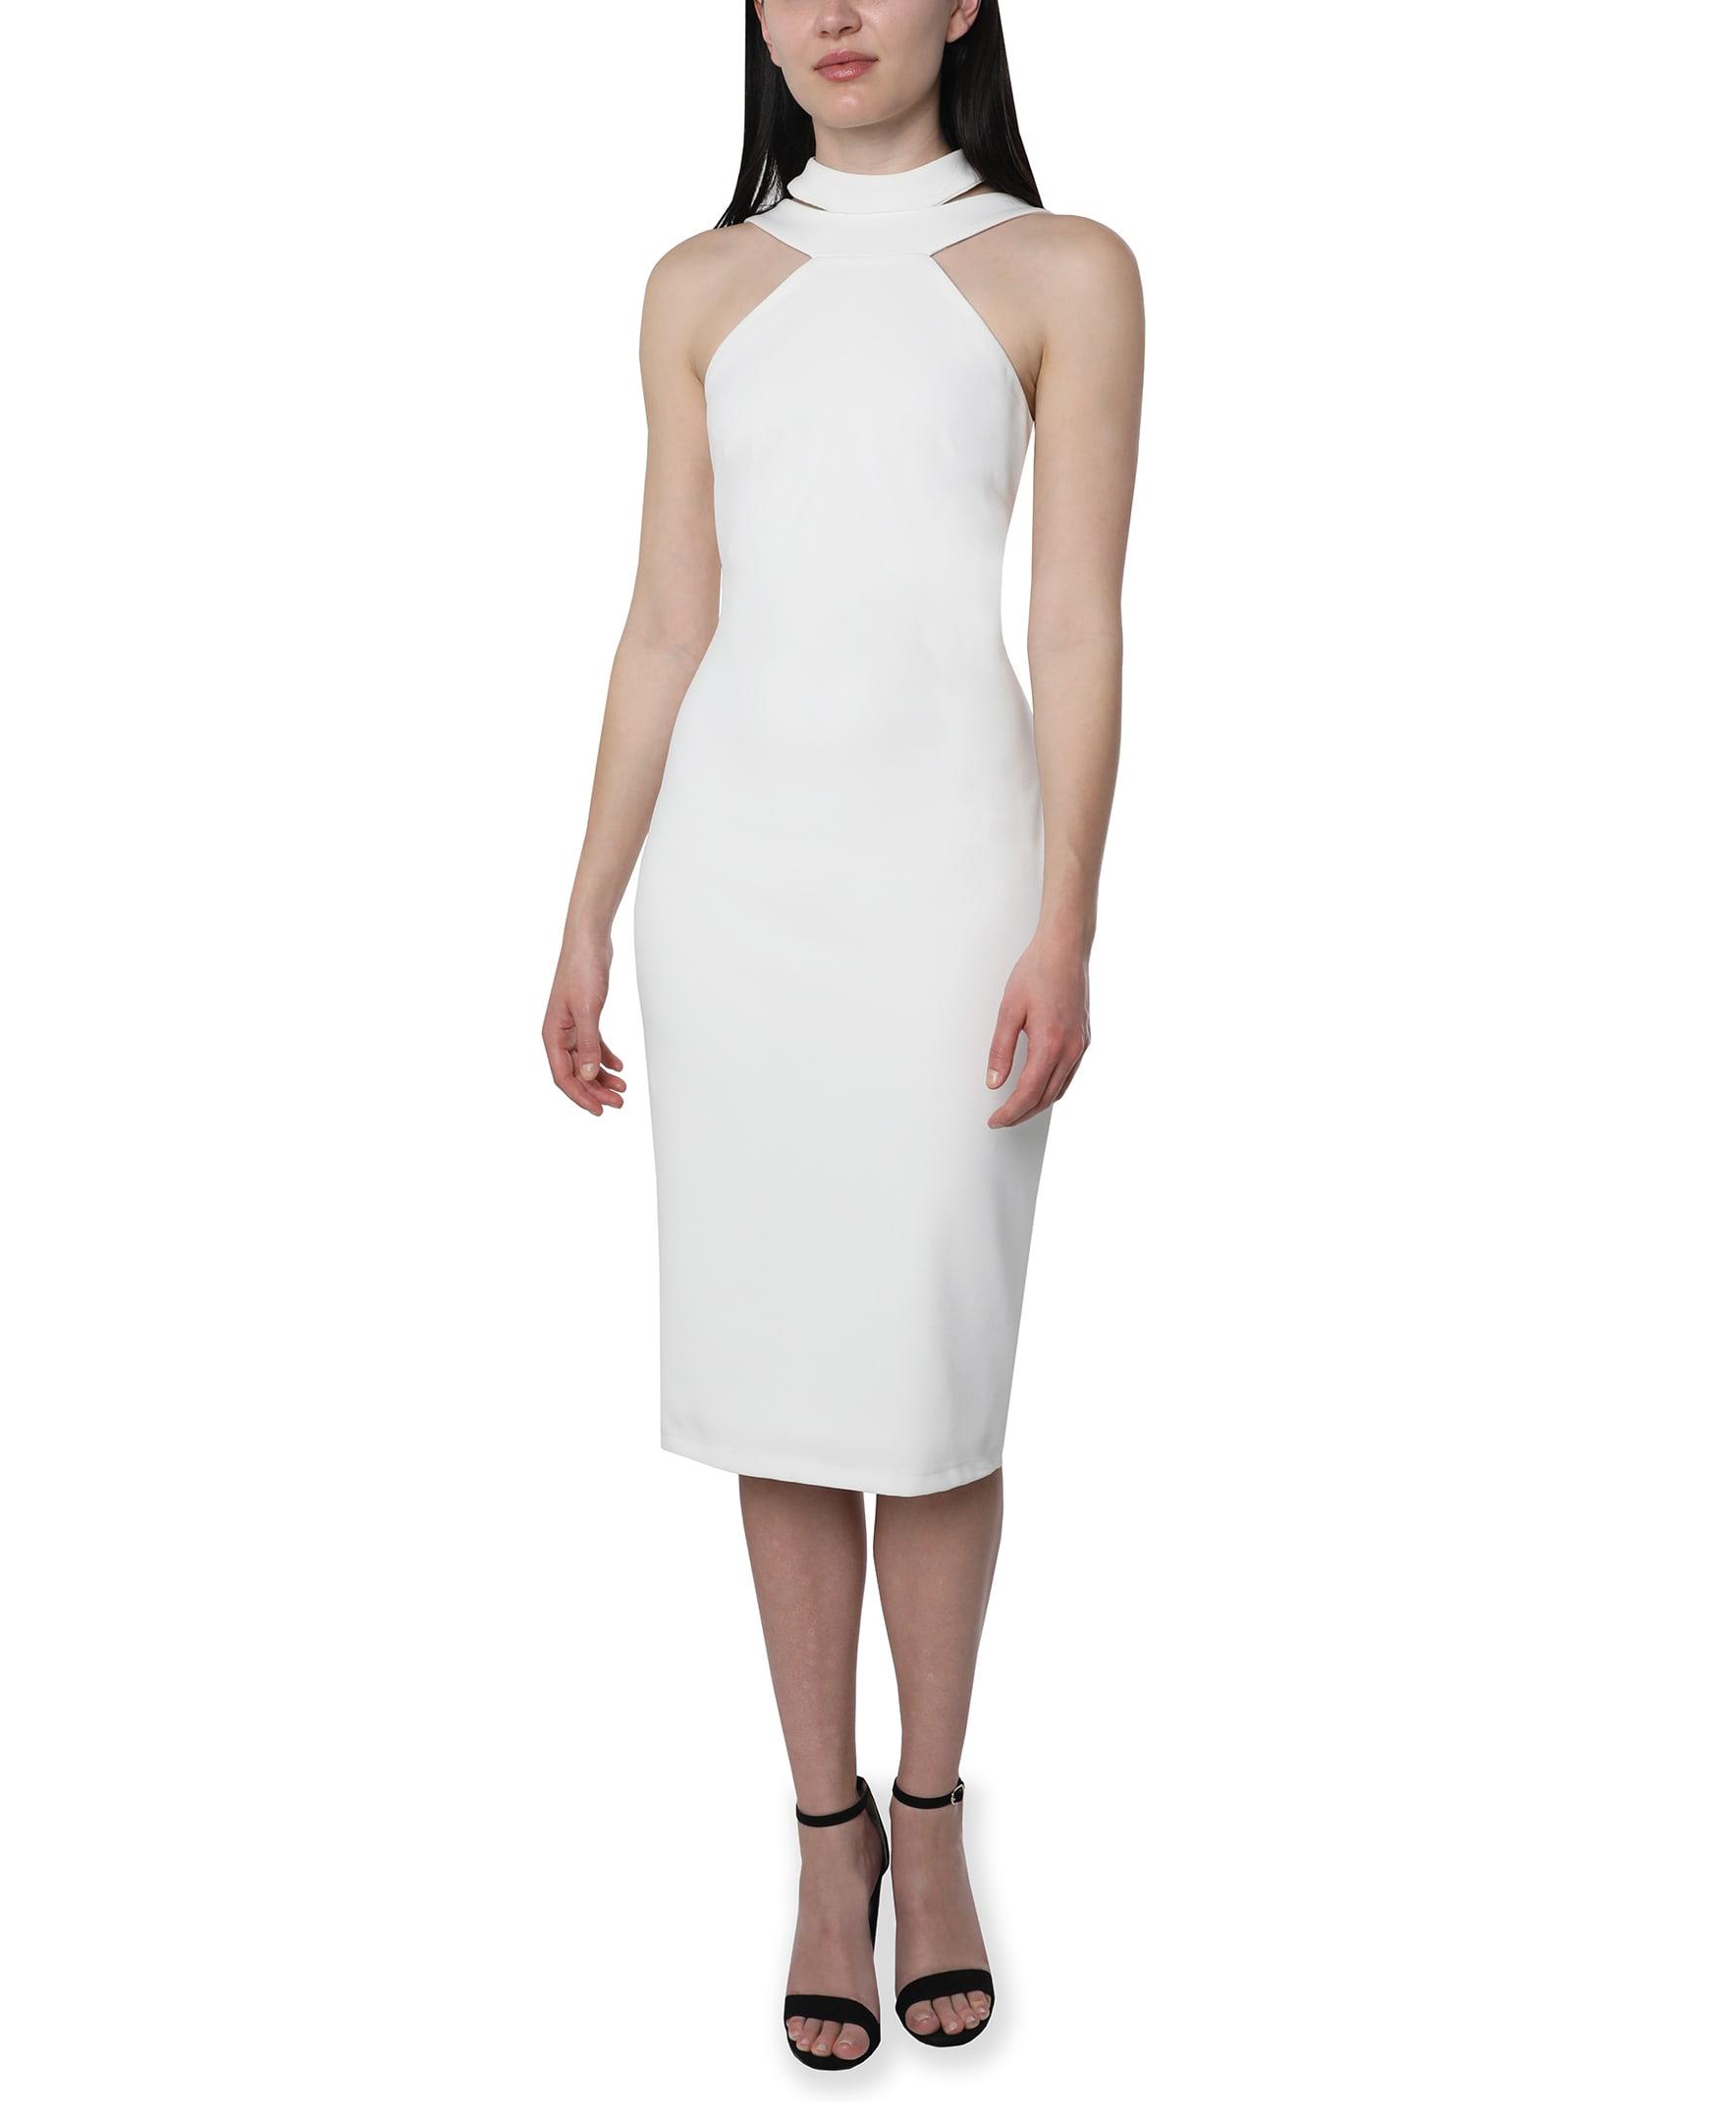 Bebe Halter Neck Midi Dress - Ivory - Front